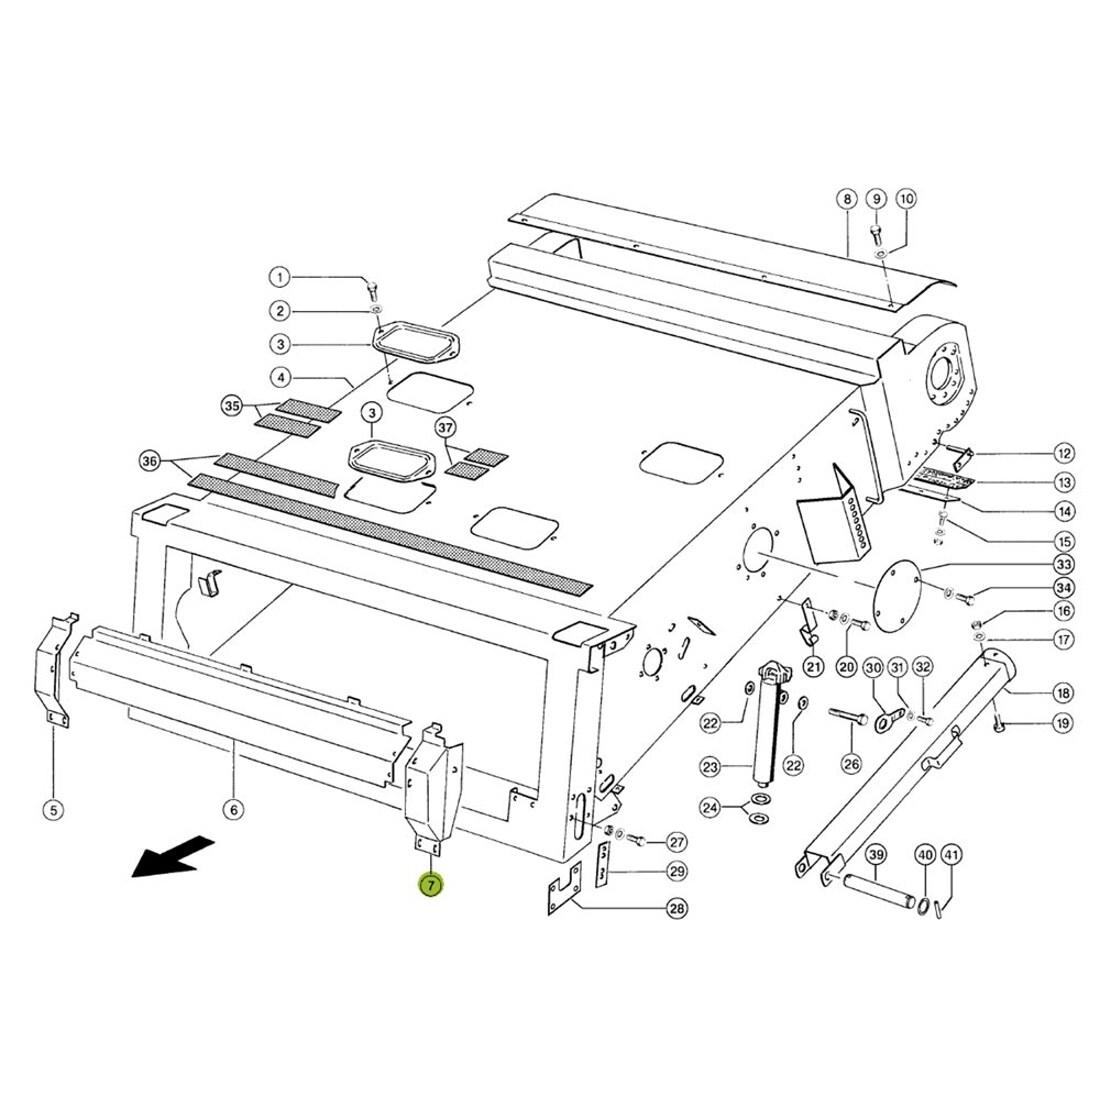 End piece left for Claas combine OEM 6306794. Buy online